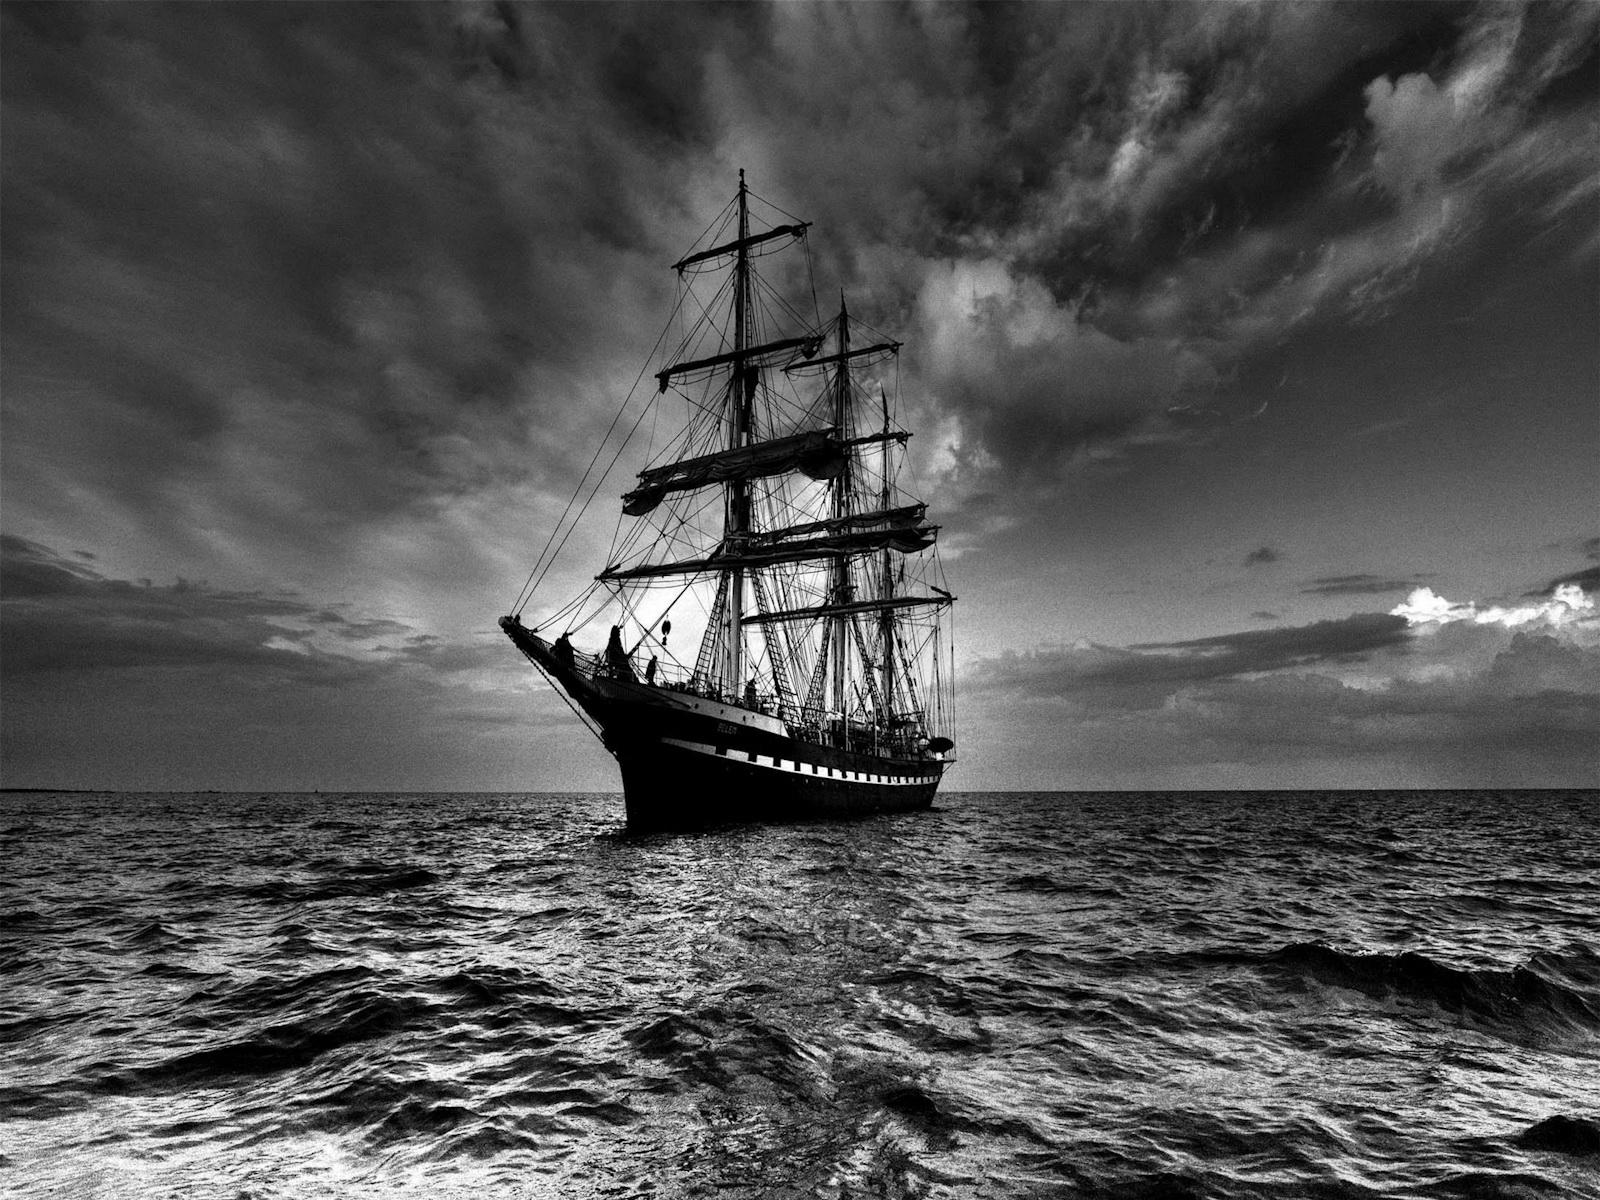 http://3.bp.blogspot.com/_Iq1fkO6qus0/TRe61hmwzPI/AAAAAAAAAYI/o0vC4fM1Ilc/s1600/Ship-Wallpapers_2612201002.jpg